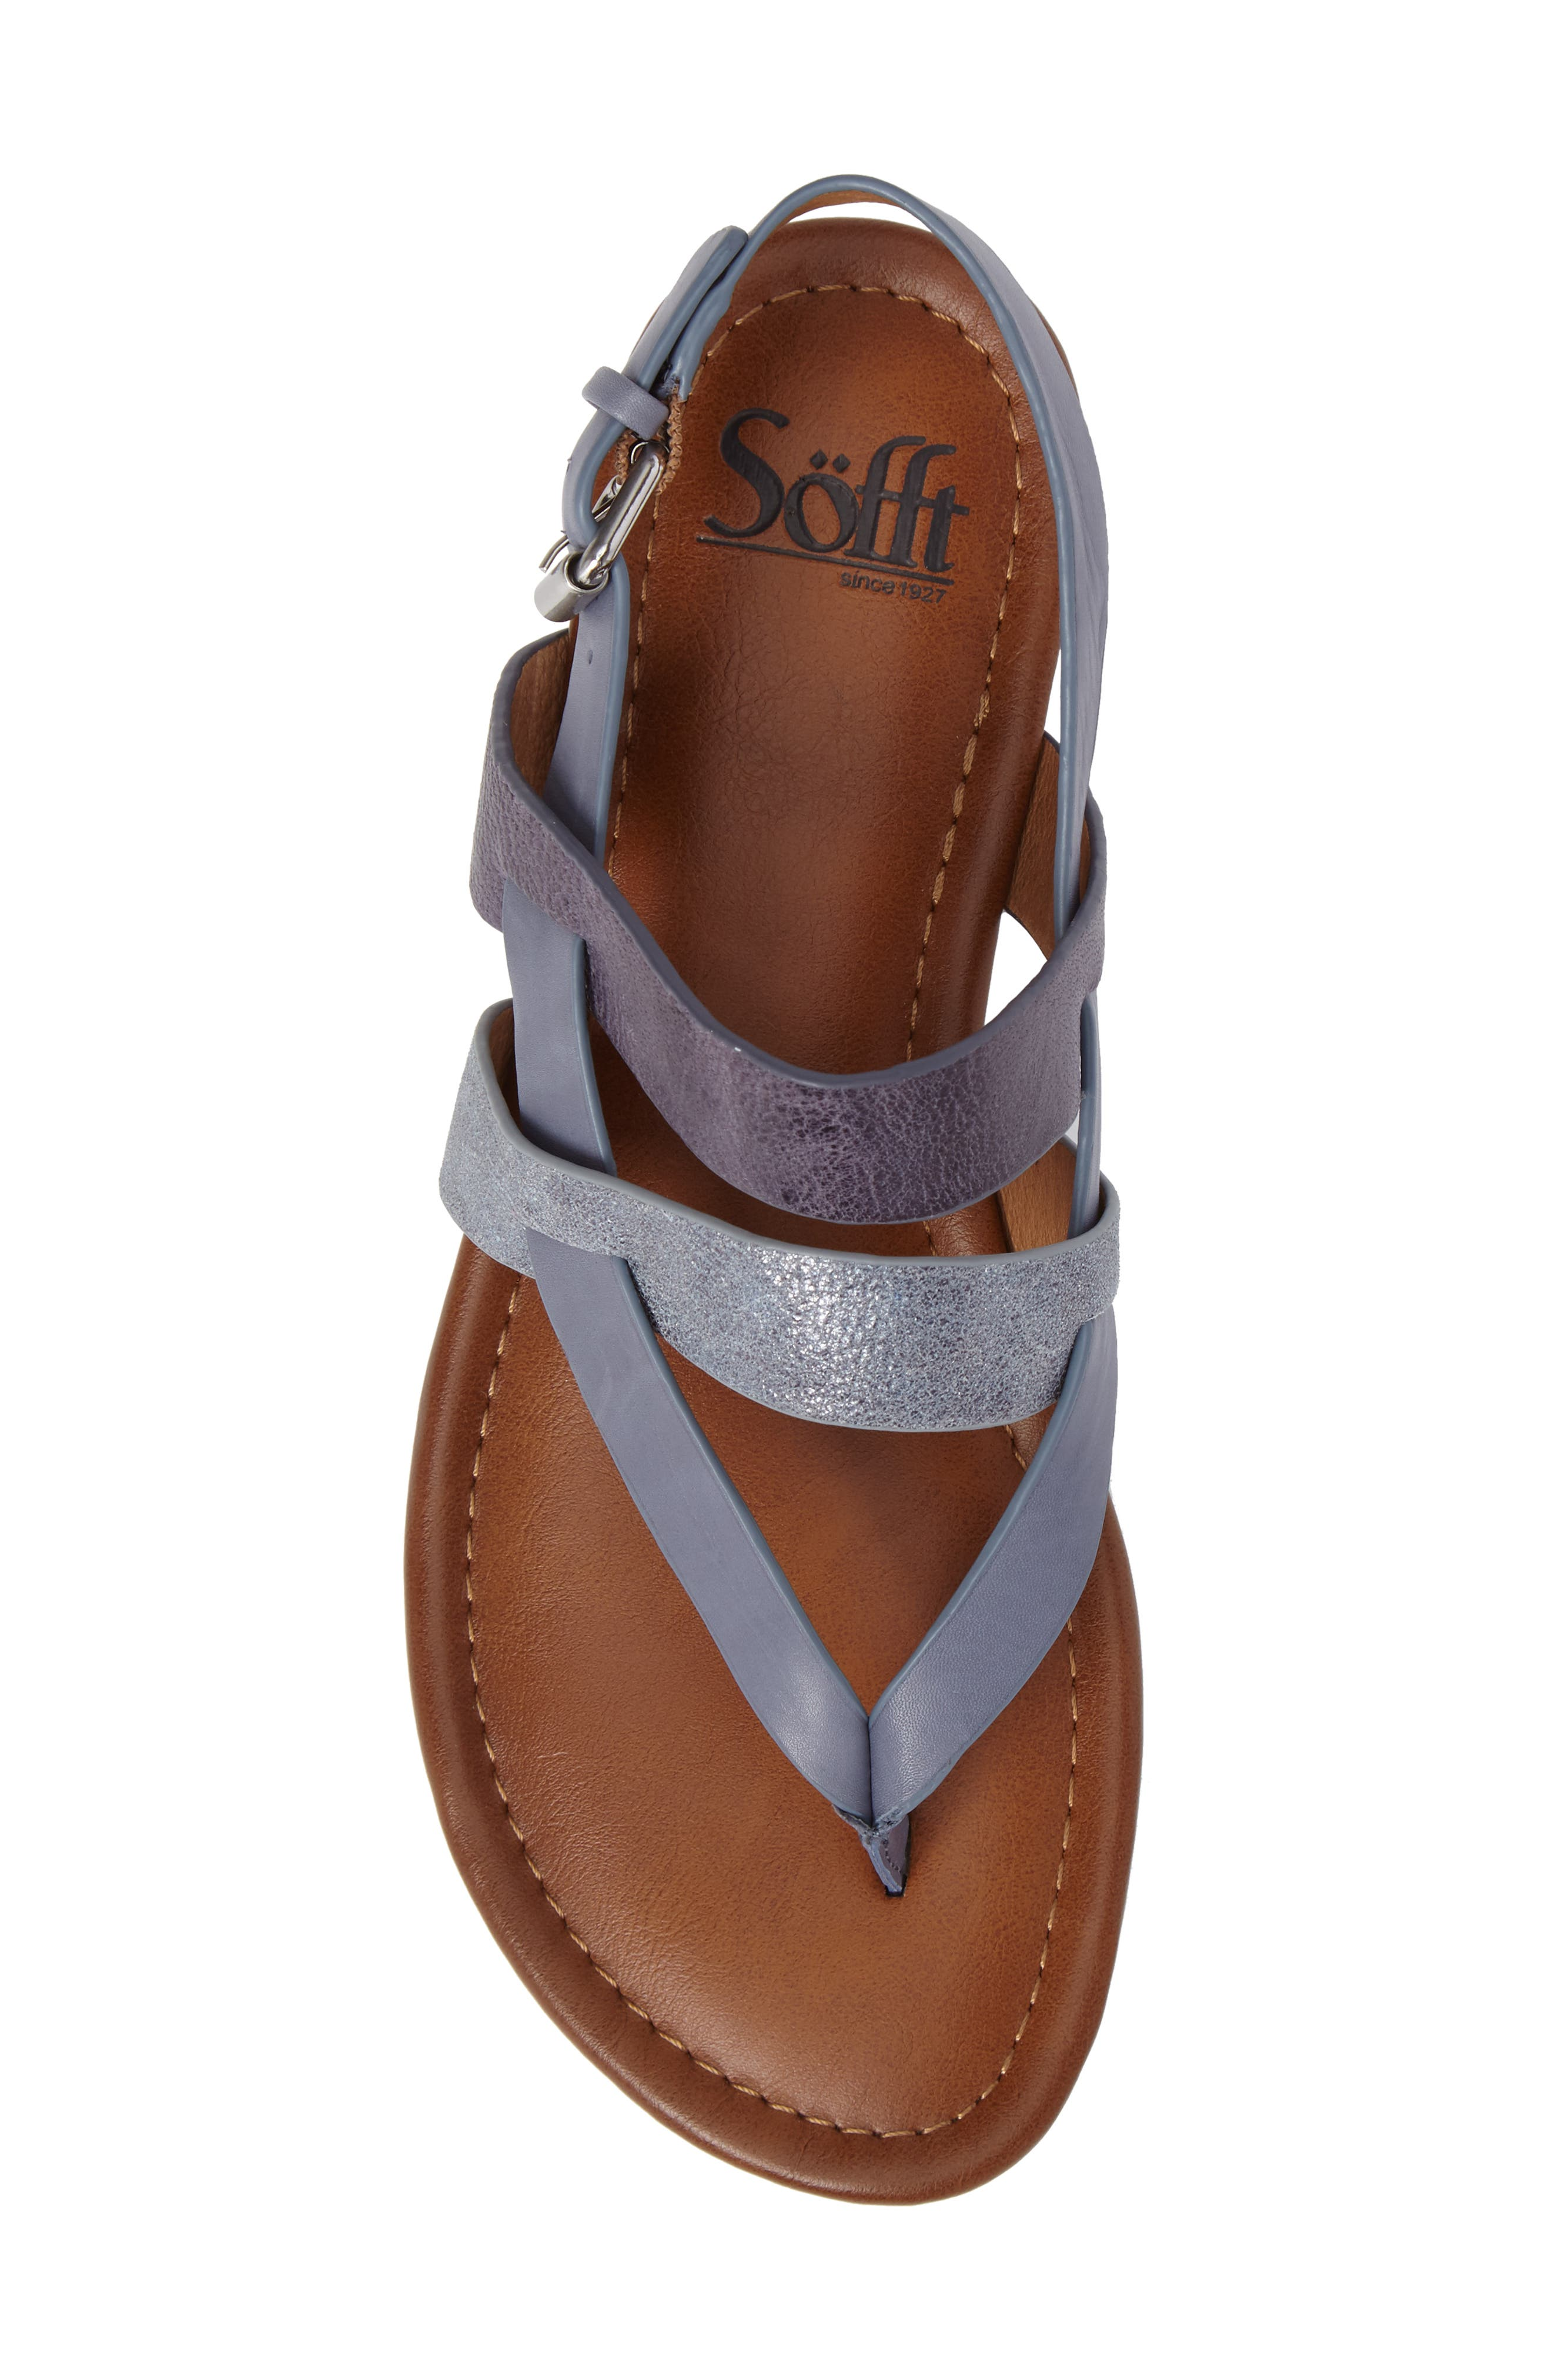 Bena Strappy Sandal,                             Alternate thumbnail 5, color,                             Denim/ Blue/ Pale Blue Leather